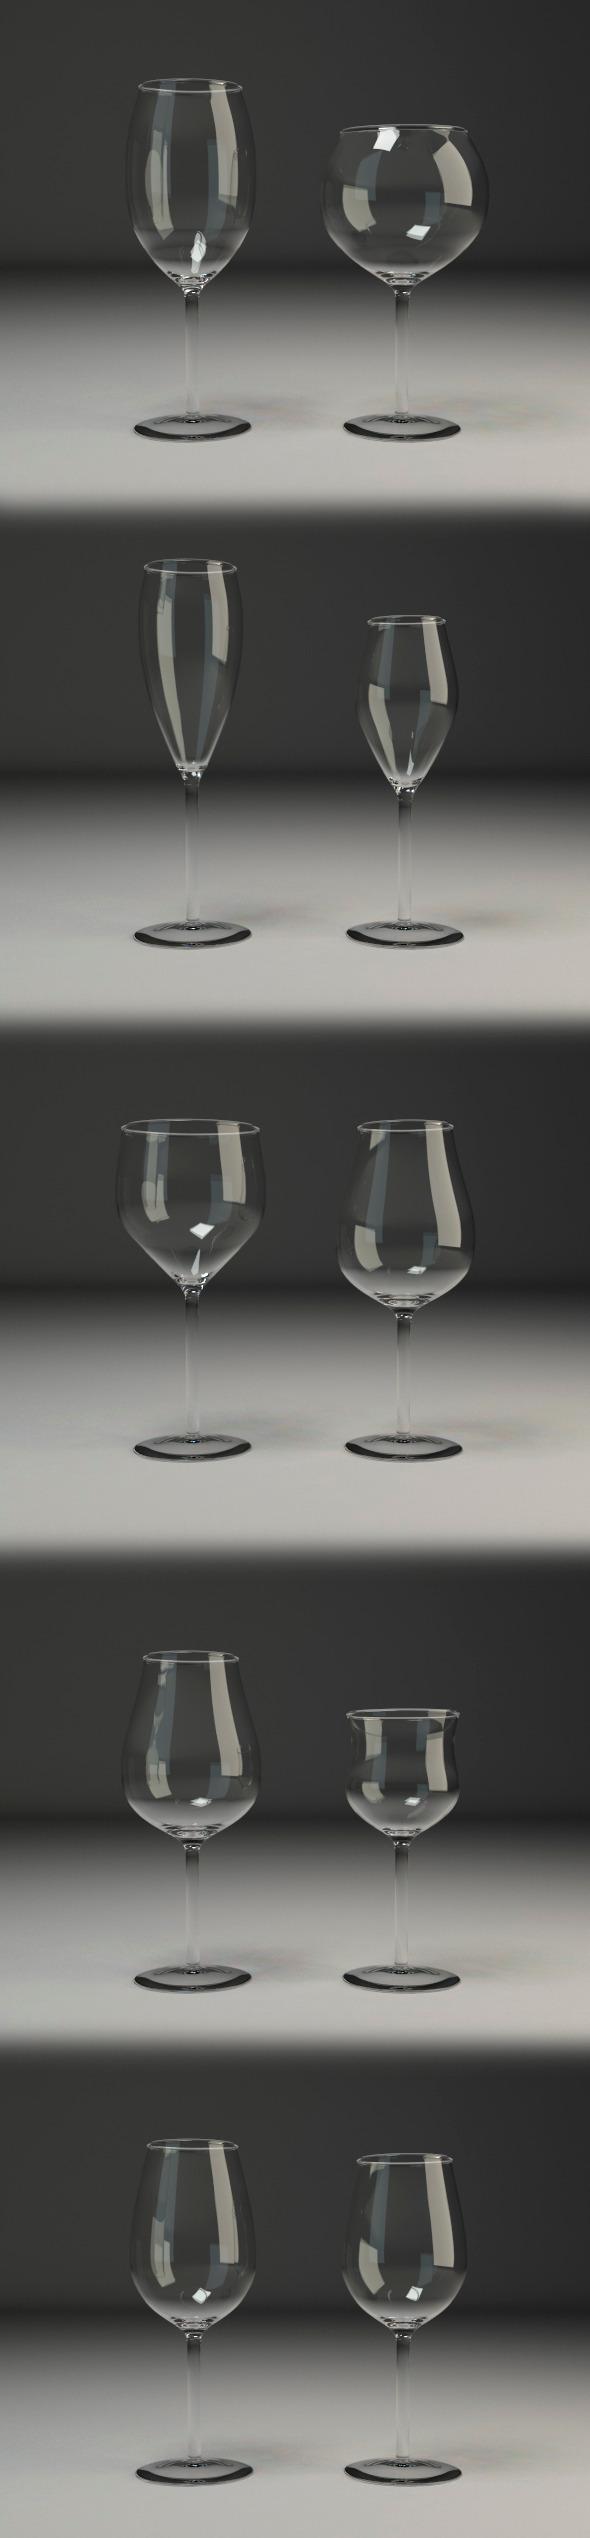 Wine glasses V1 - 3DOcean Item for Sale